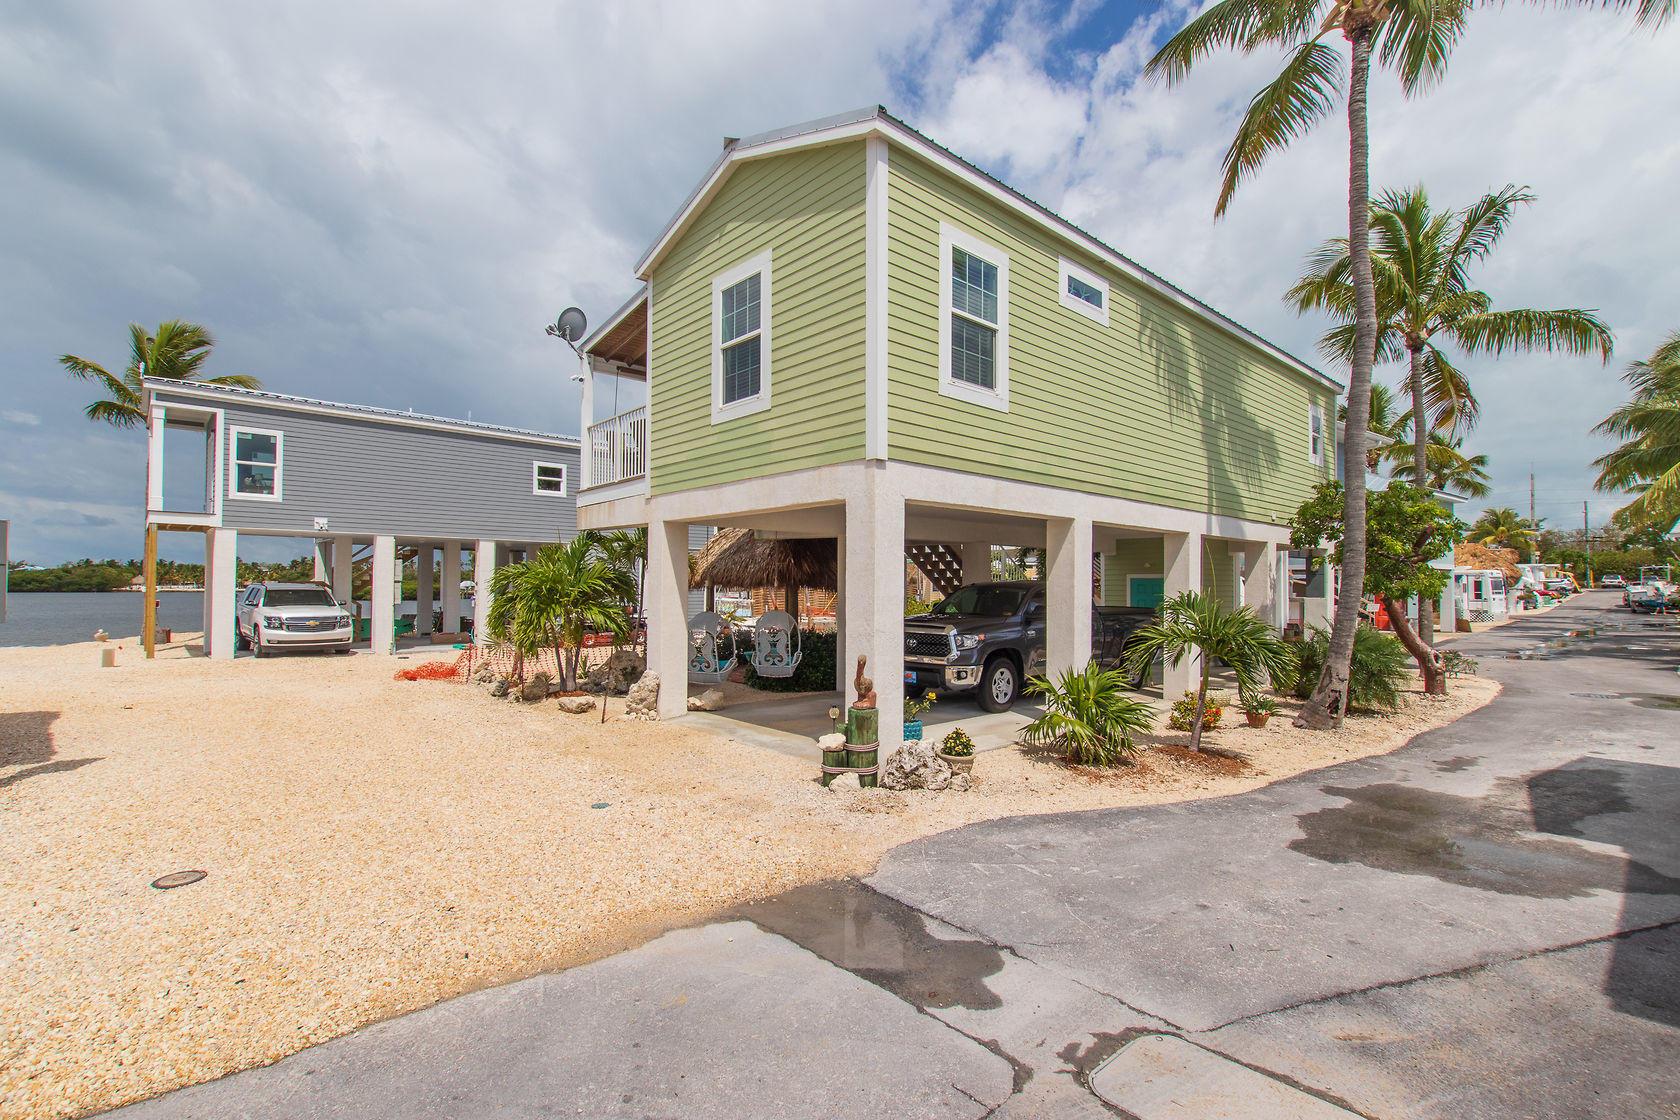 Sensational Oceanfront Homes Fl Keys Real Estate Islamorada Marathon Interior Design Ideas Gresisoteloinfo